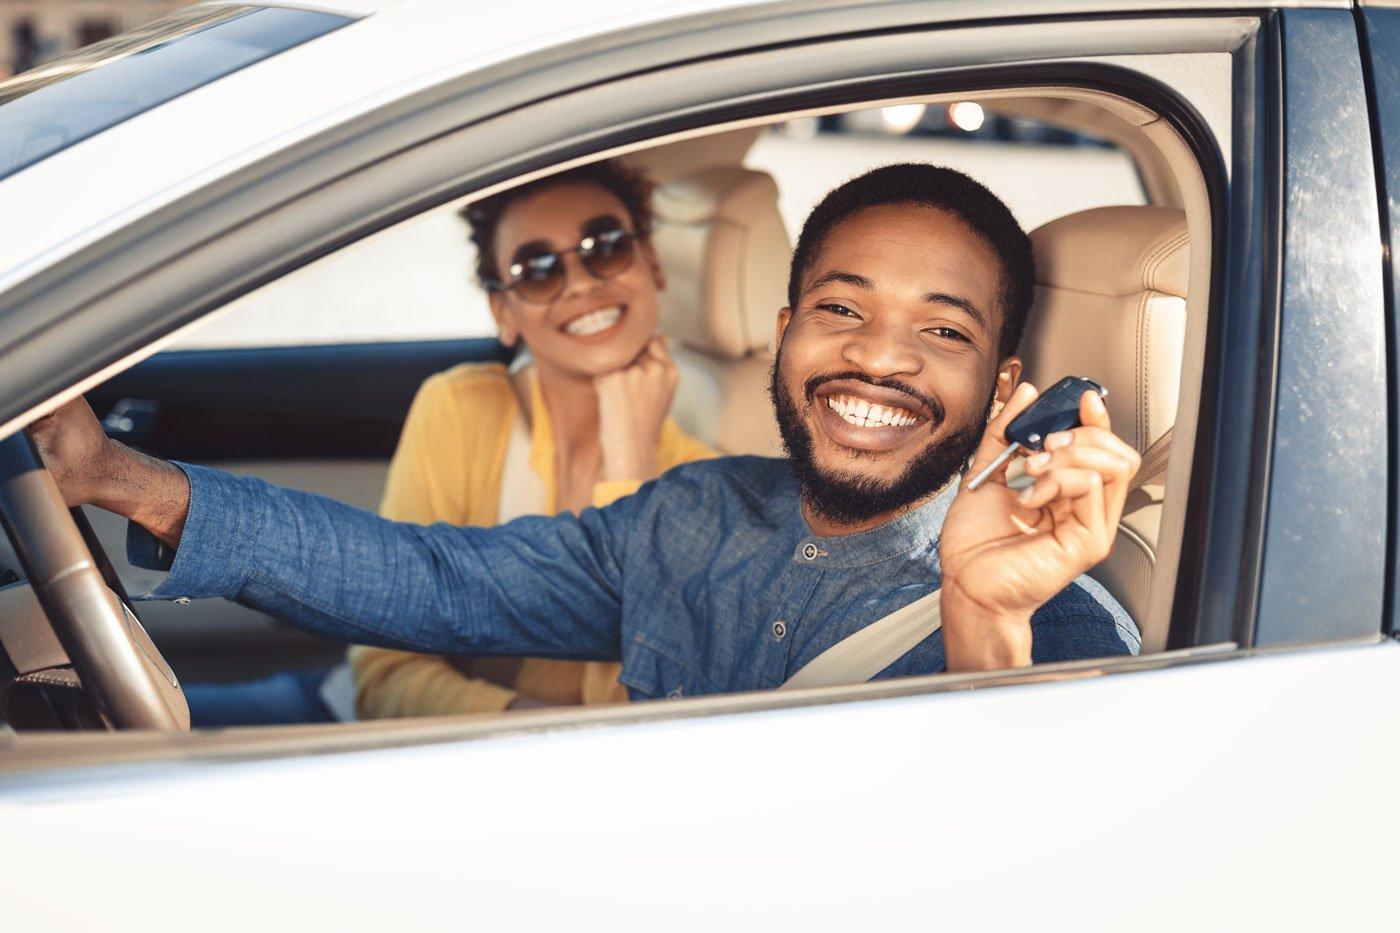 happy-car-customer-vds